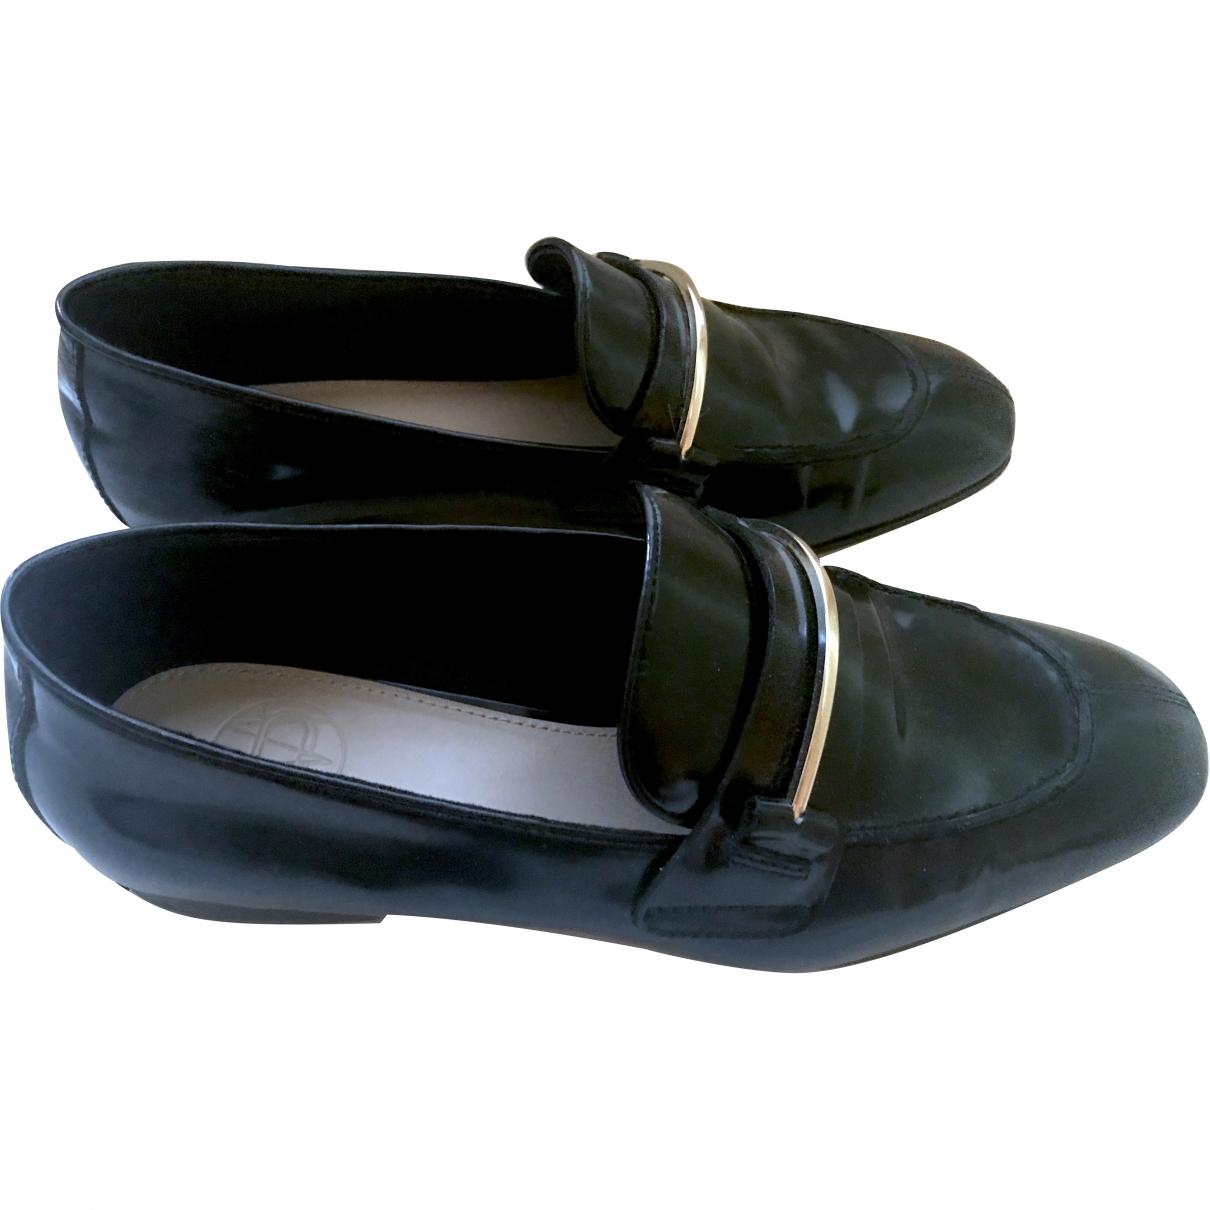 Massimo Dutti \N Black Patent leather Flats for Women 37 EU